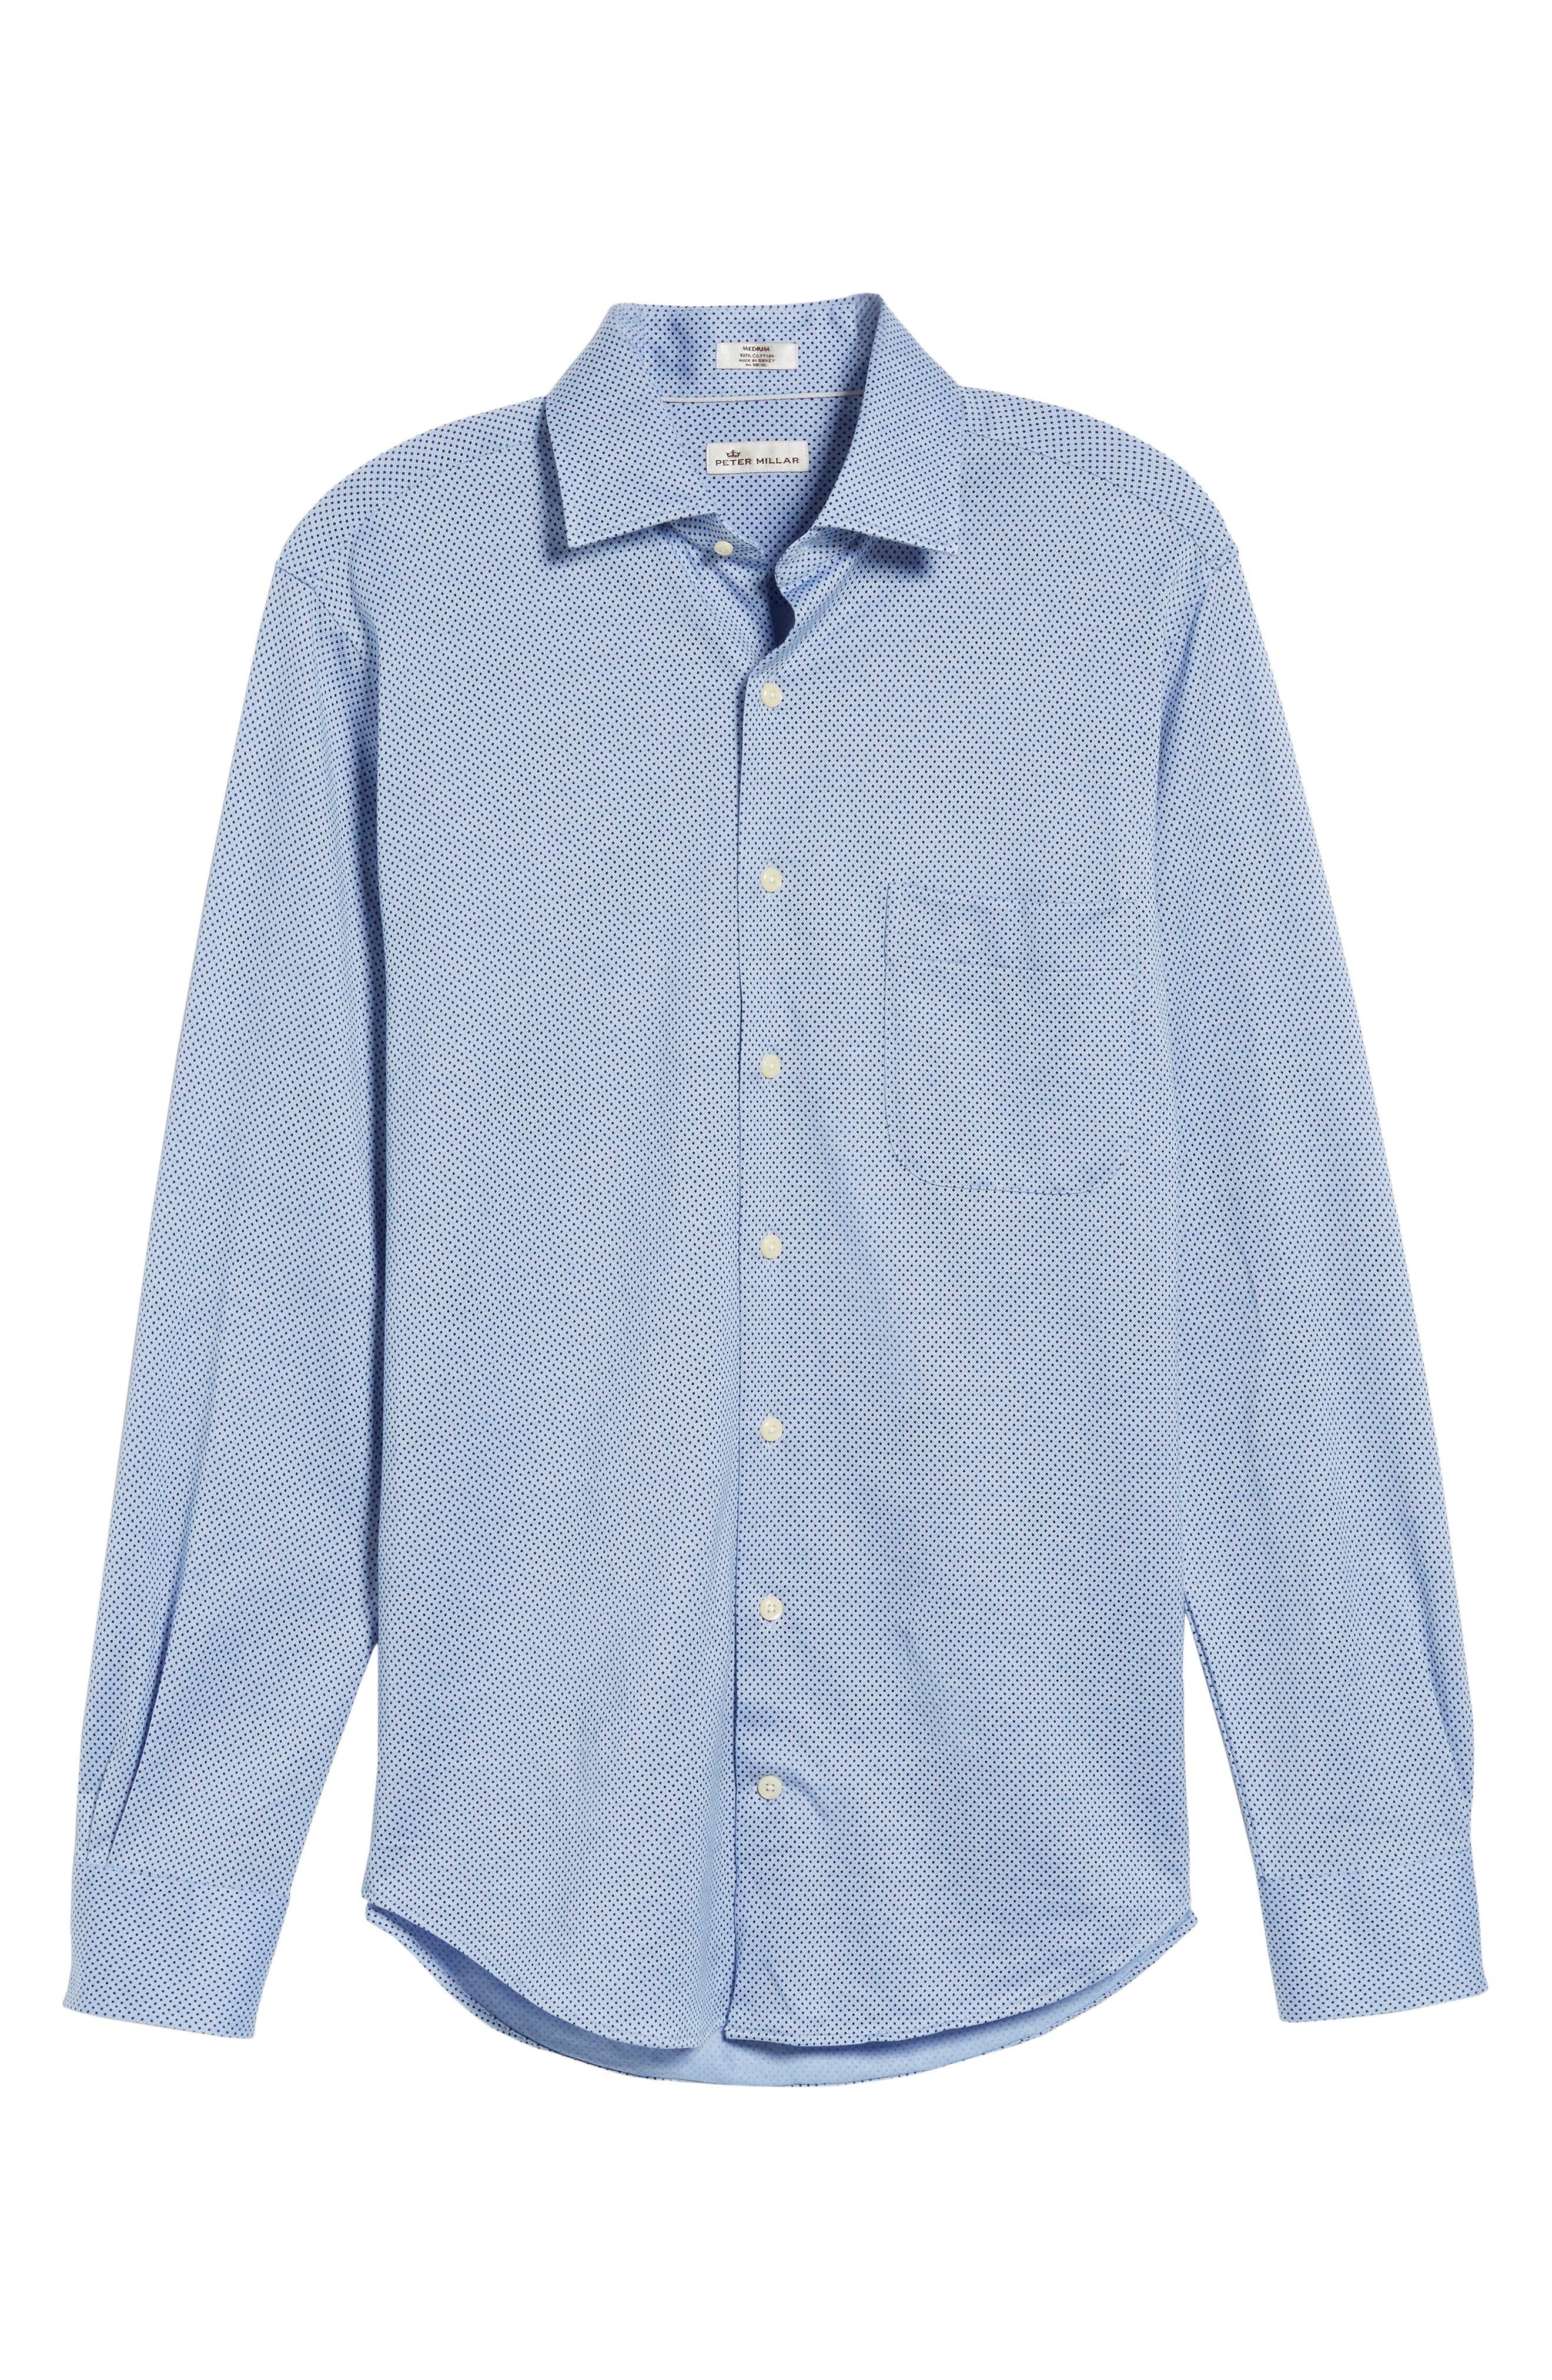 Mesh Dot Classic Fit Sport Shirt,                             Alternate thumbnail 6, color,                             Tar Heel Blue